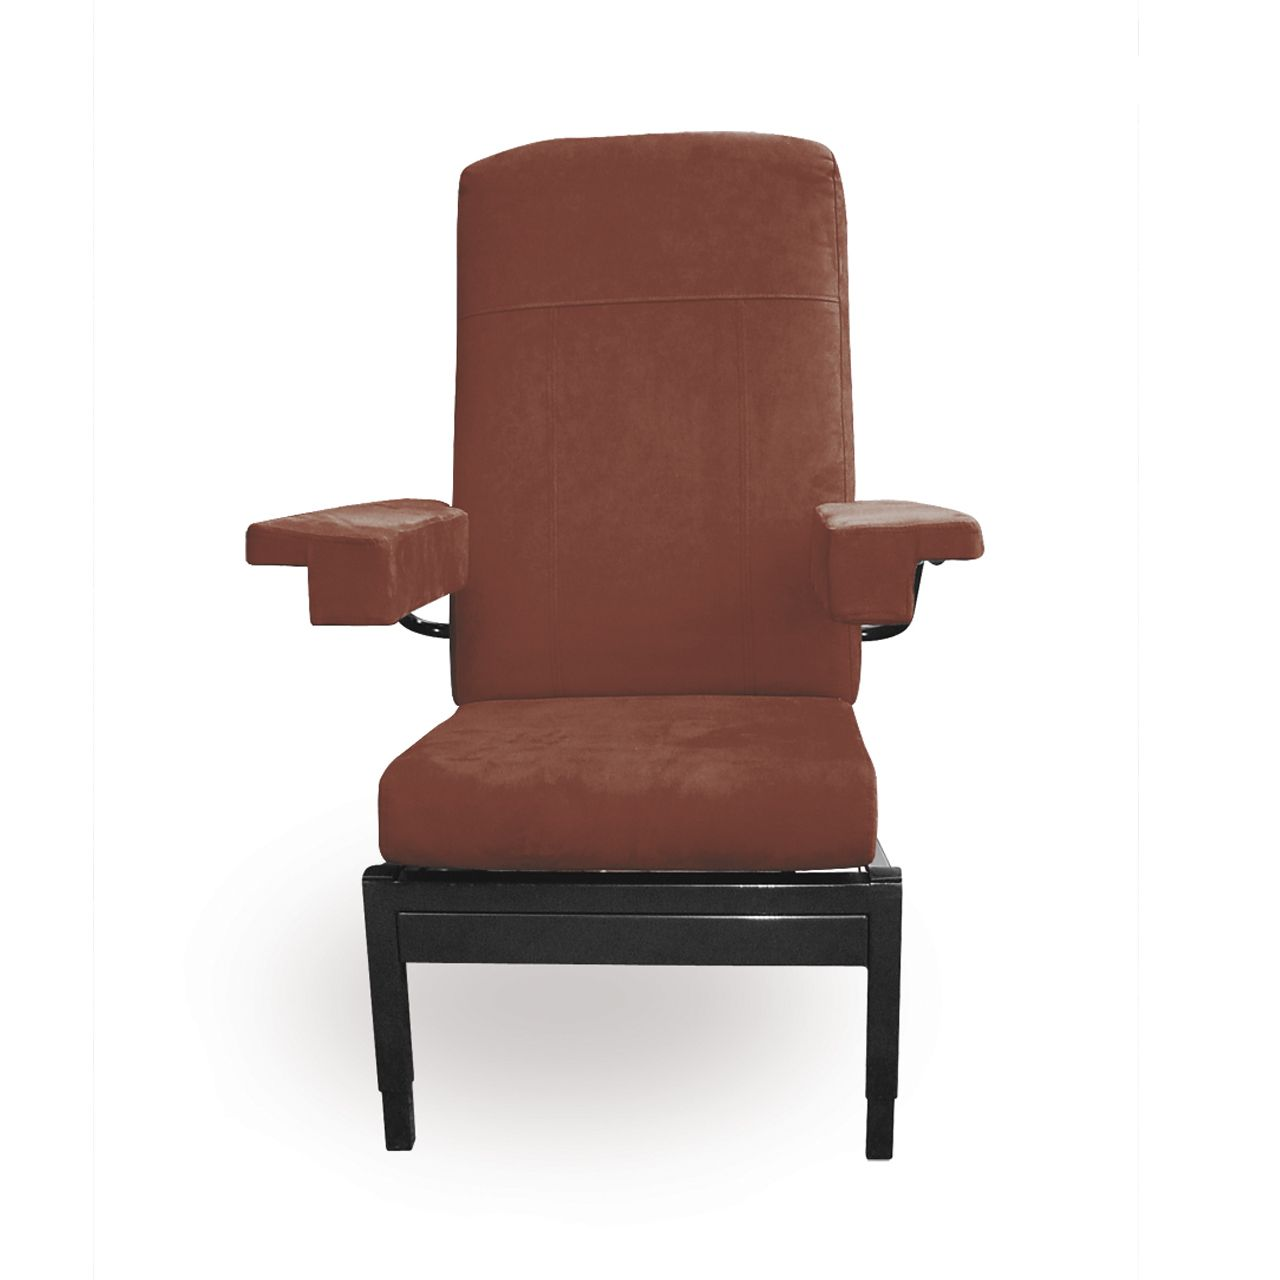 basic-stoel-zorg voorkant